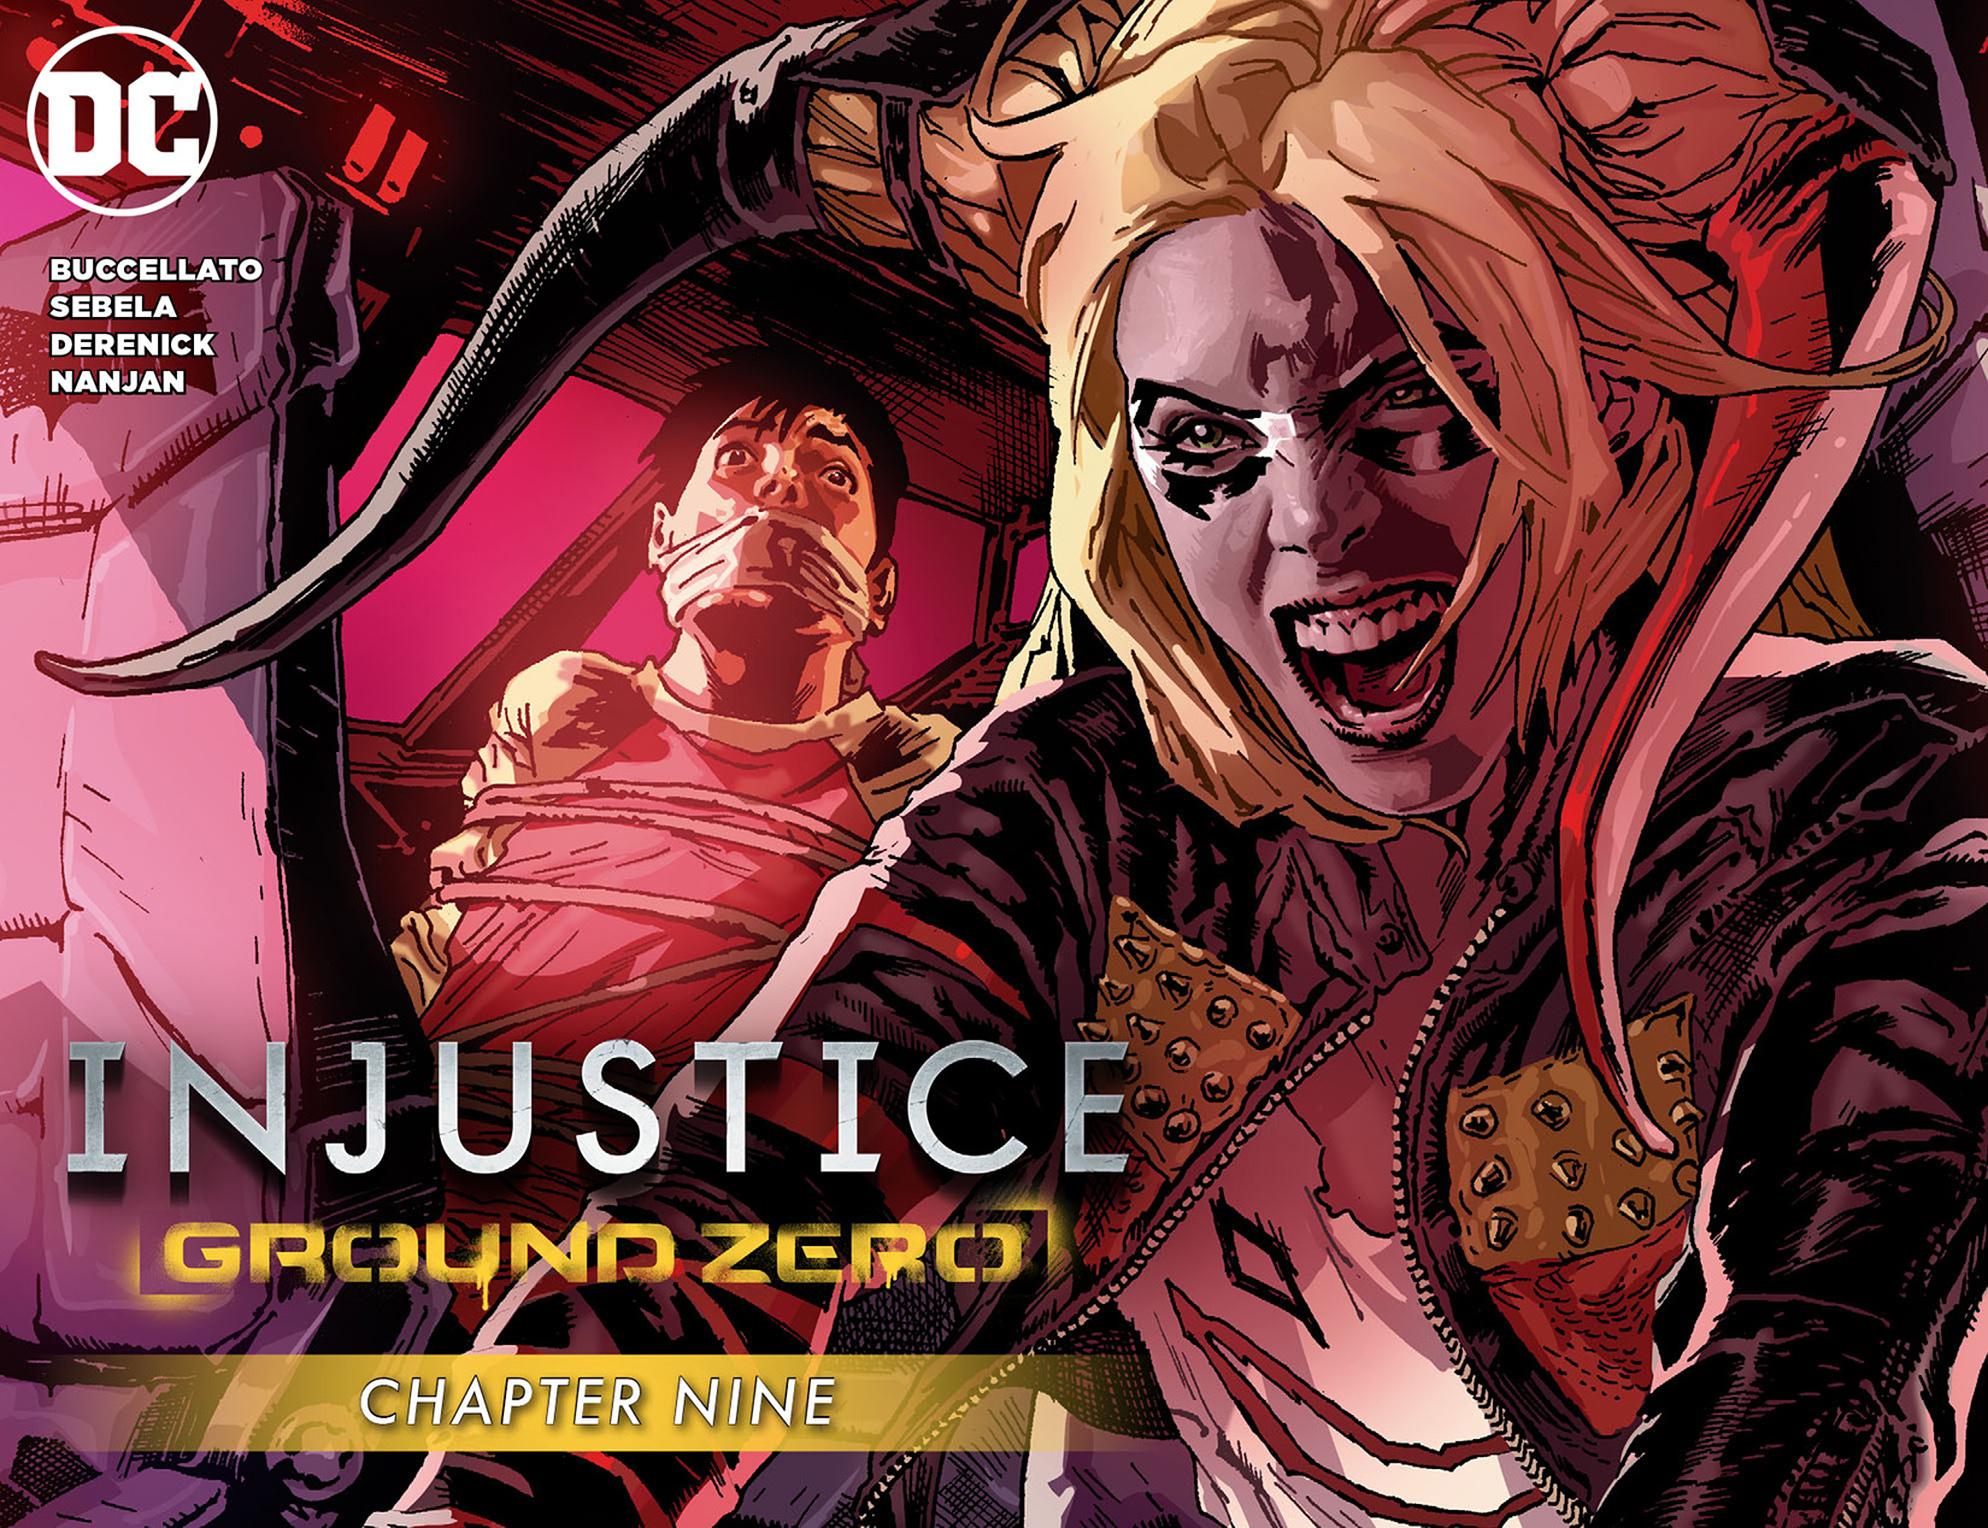 Read online Injustice: Ground Zero comic -  Issue #9 - 1